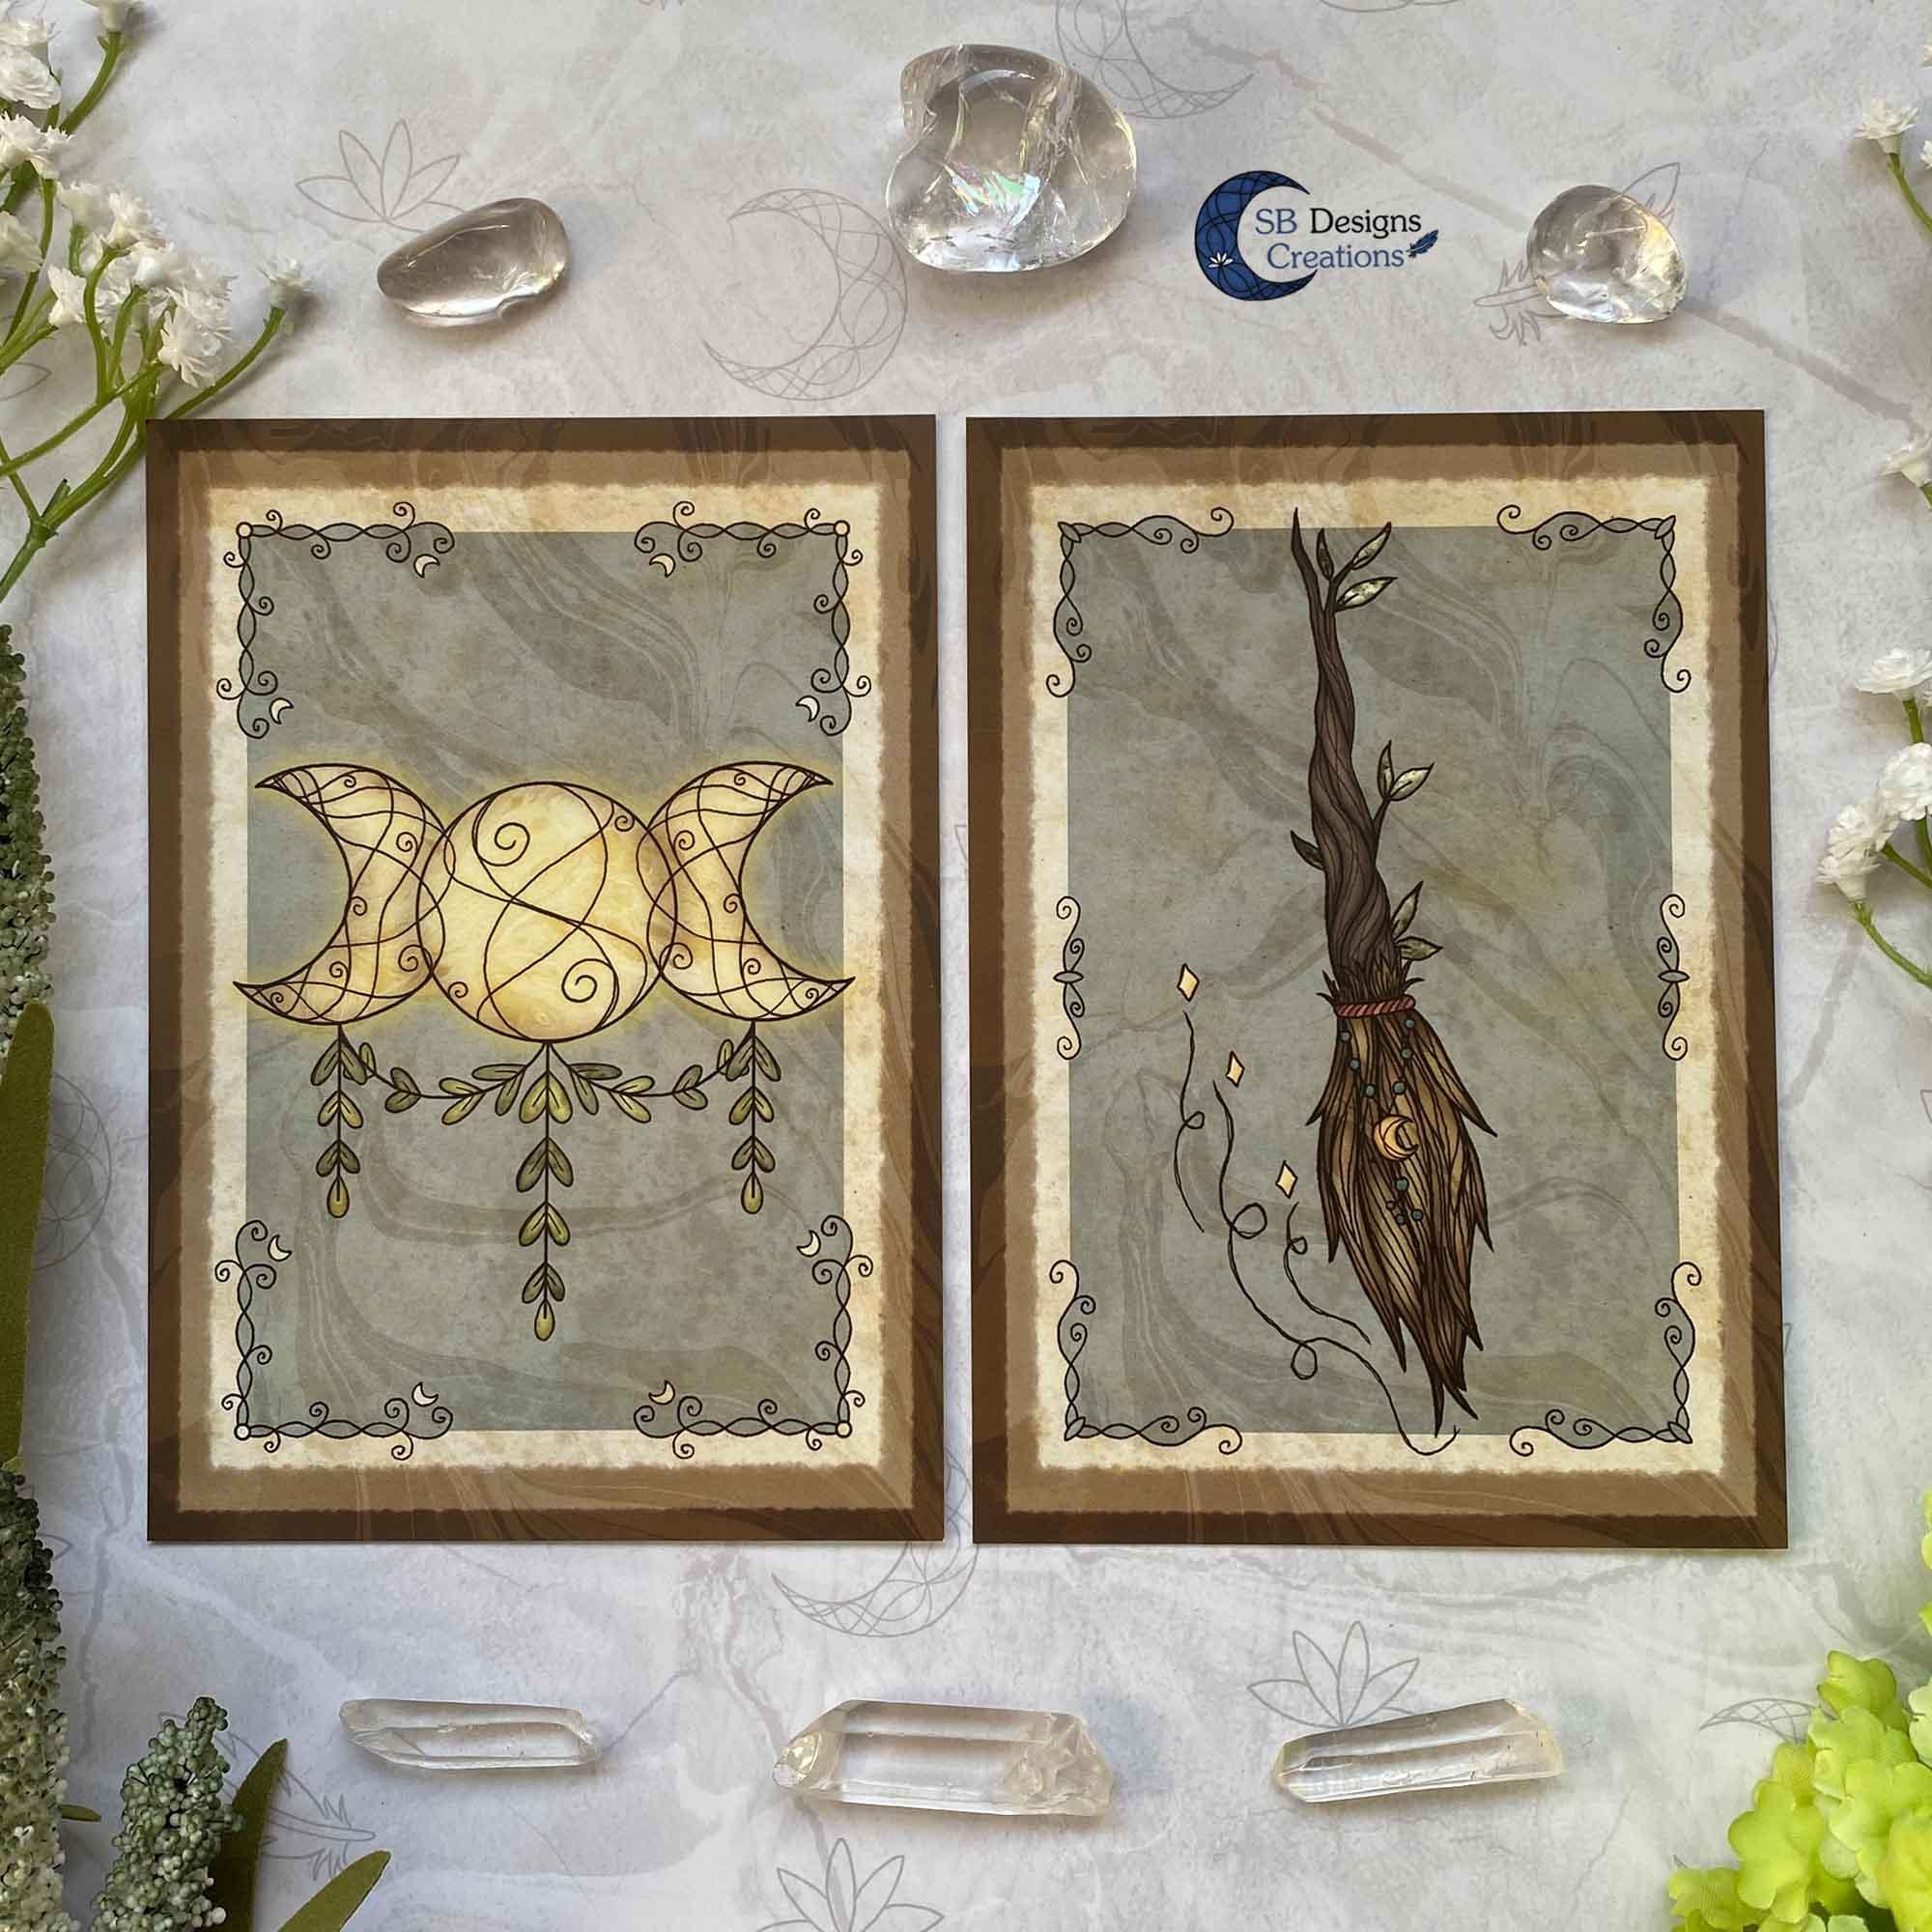 Heks Ansichtkaarten Witchy Vibes heksenhoed Bezem Triple Moon Vuurmagie Cauldron Art-4